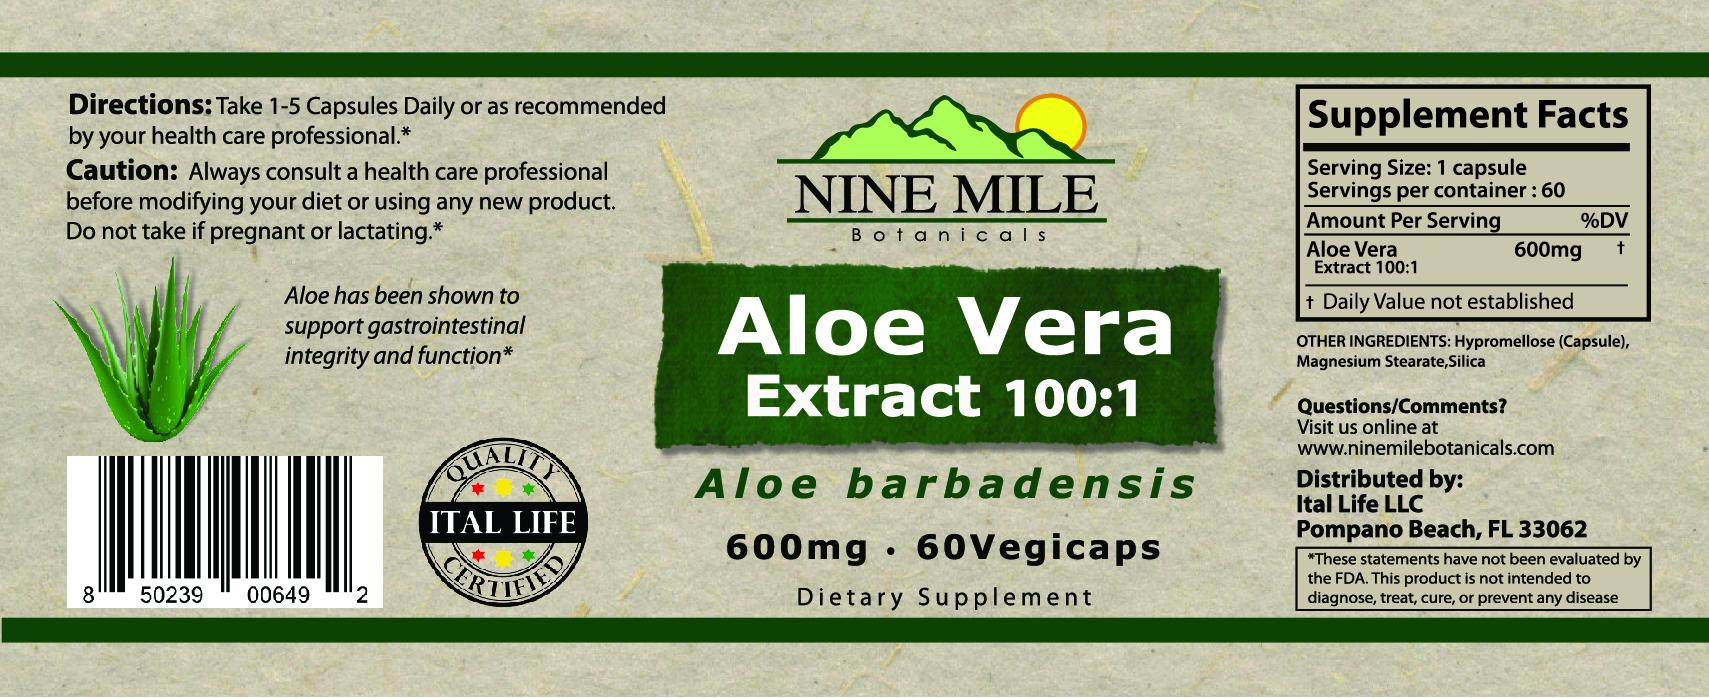 Nine Mile Botanicals Aloe Vera label